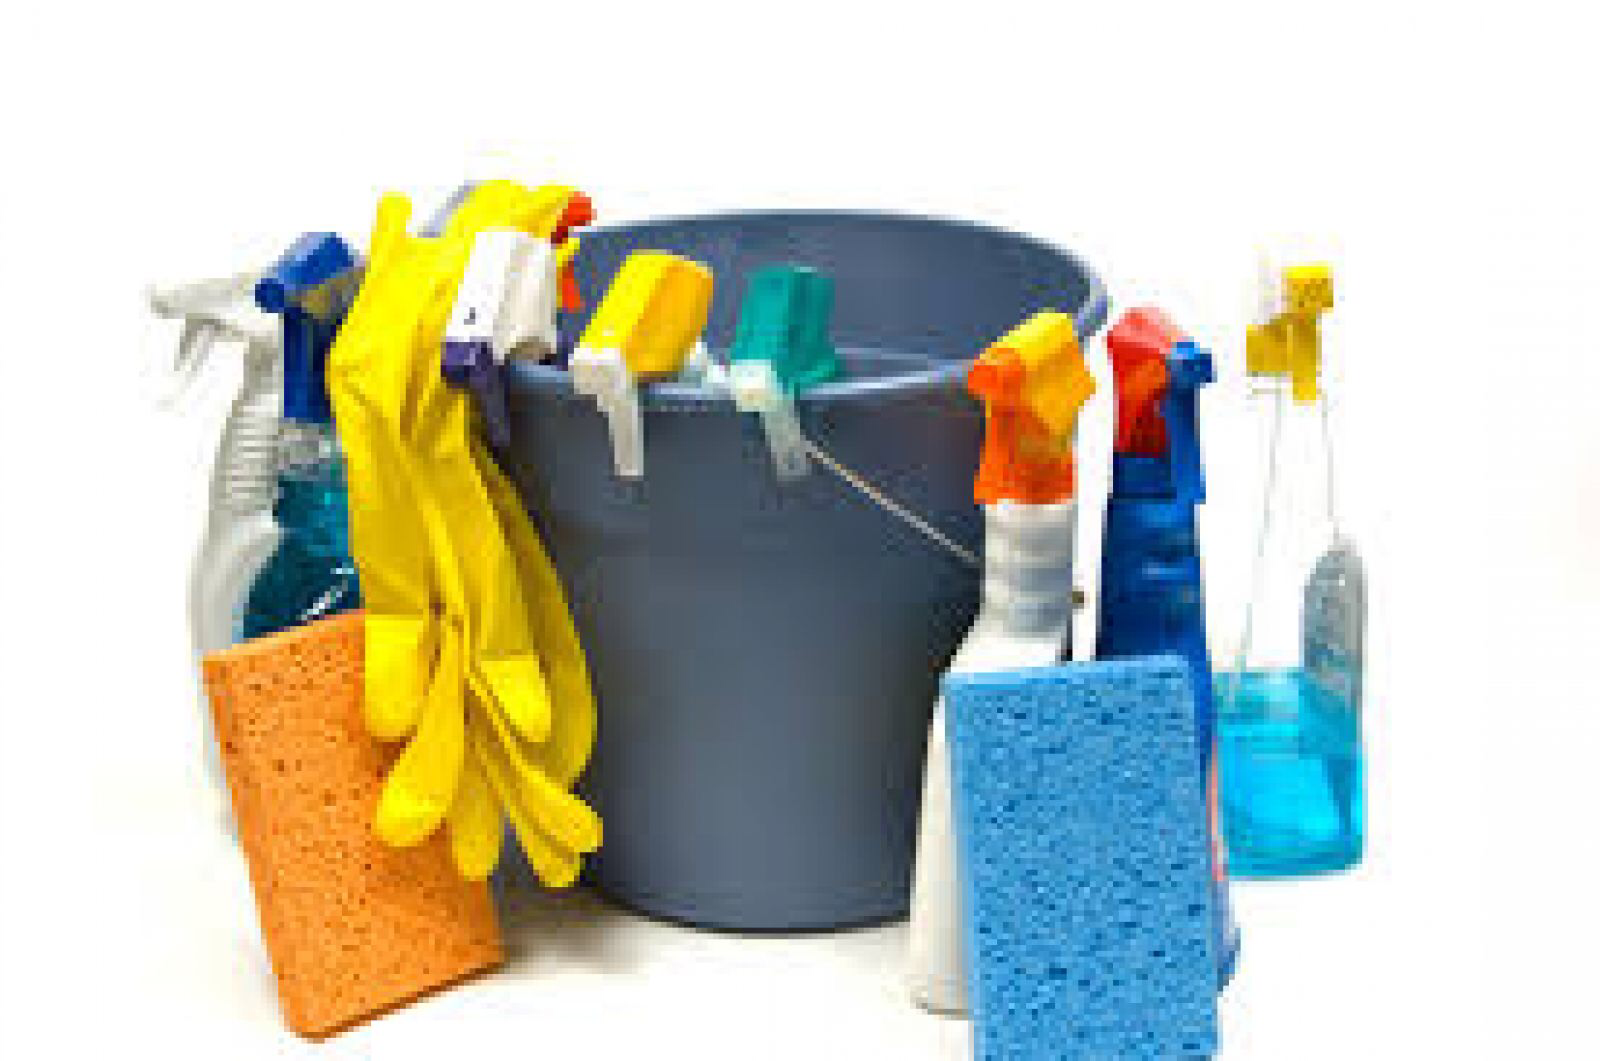 Oproep schoonmaak